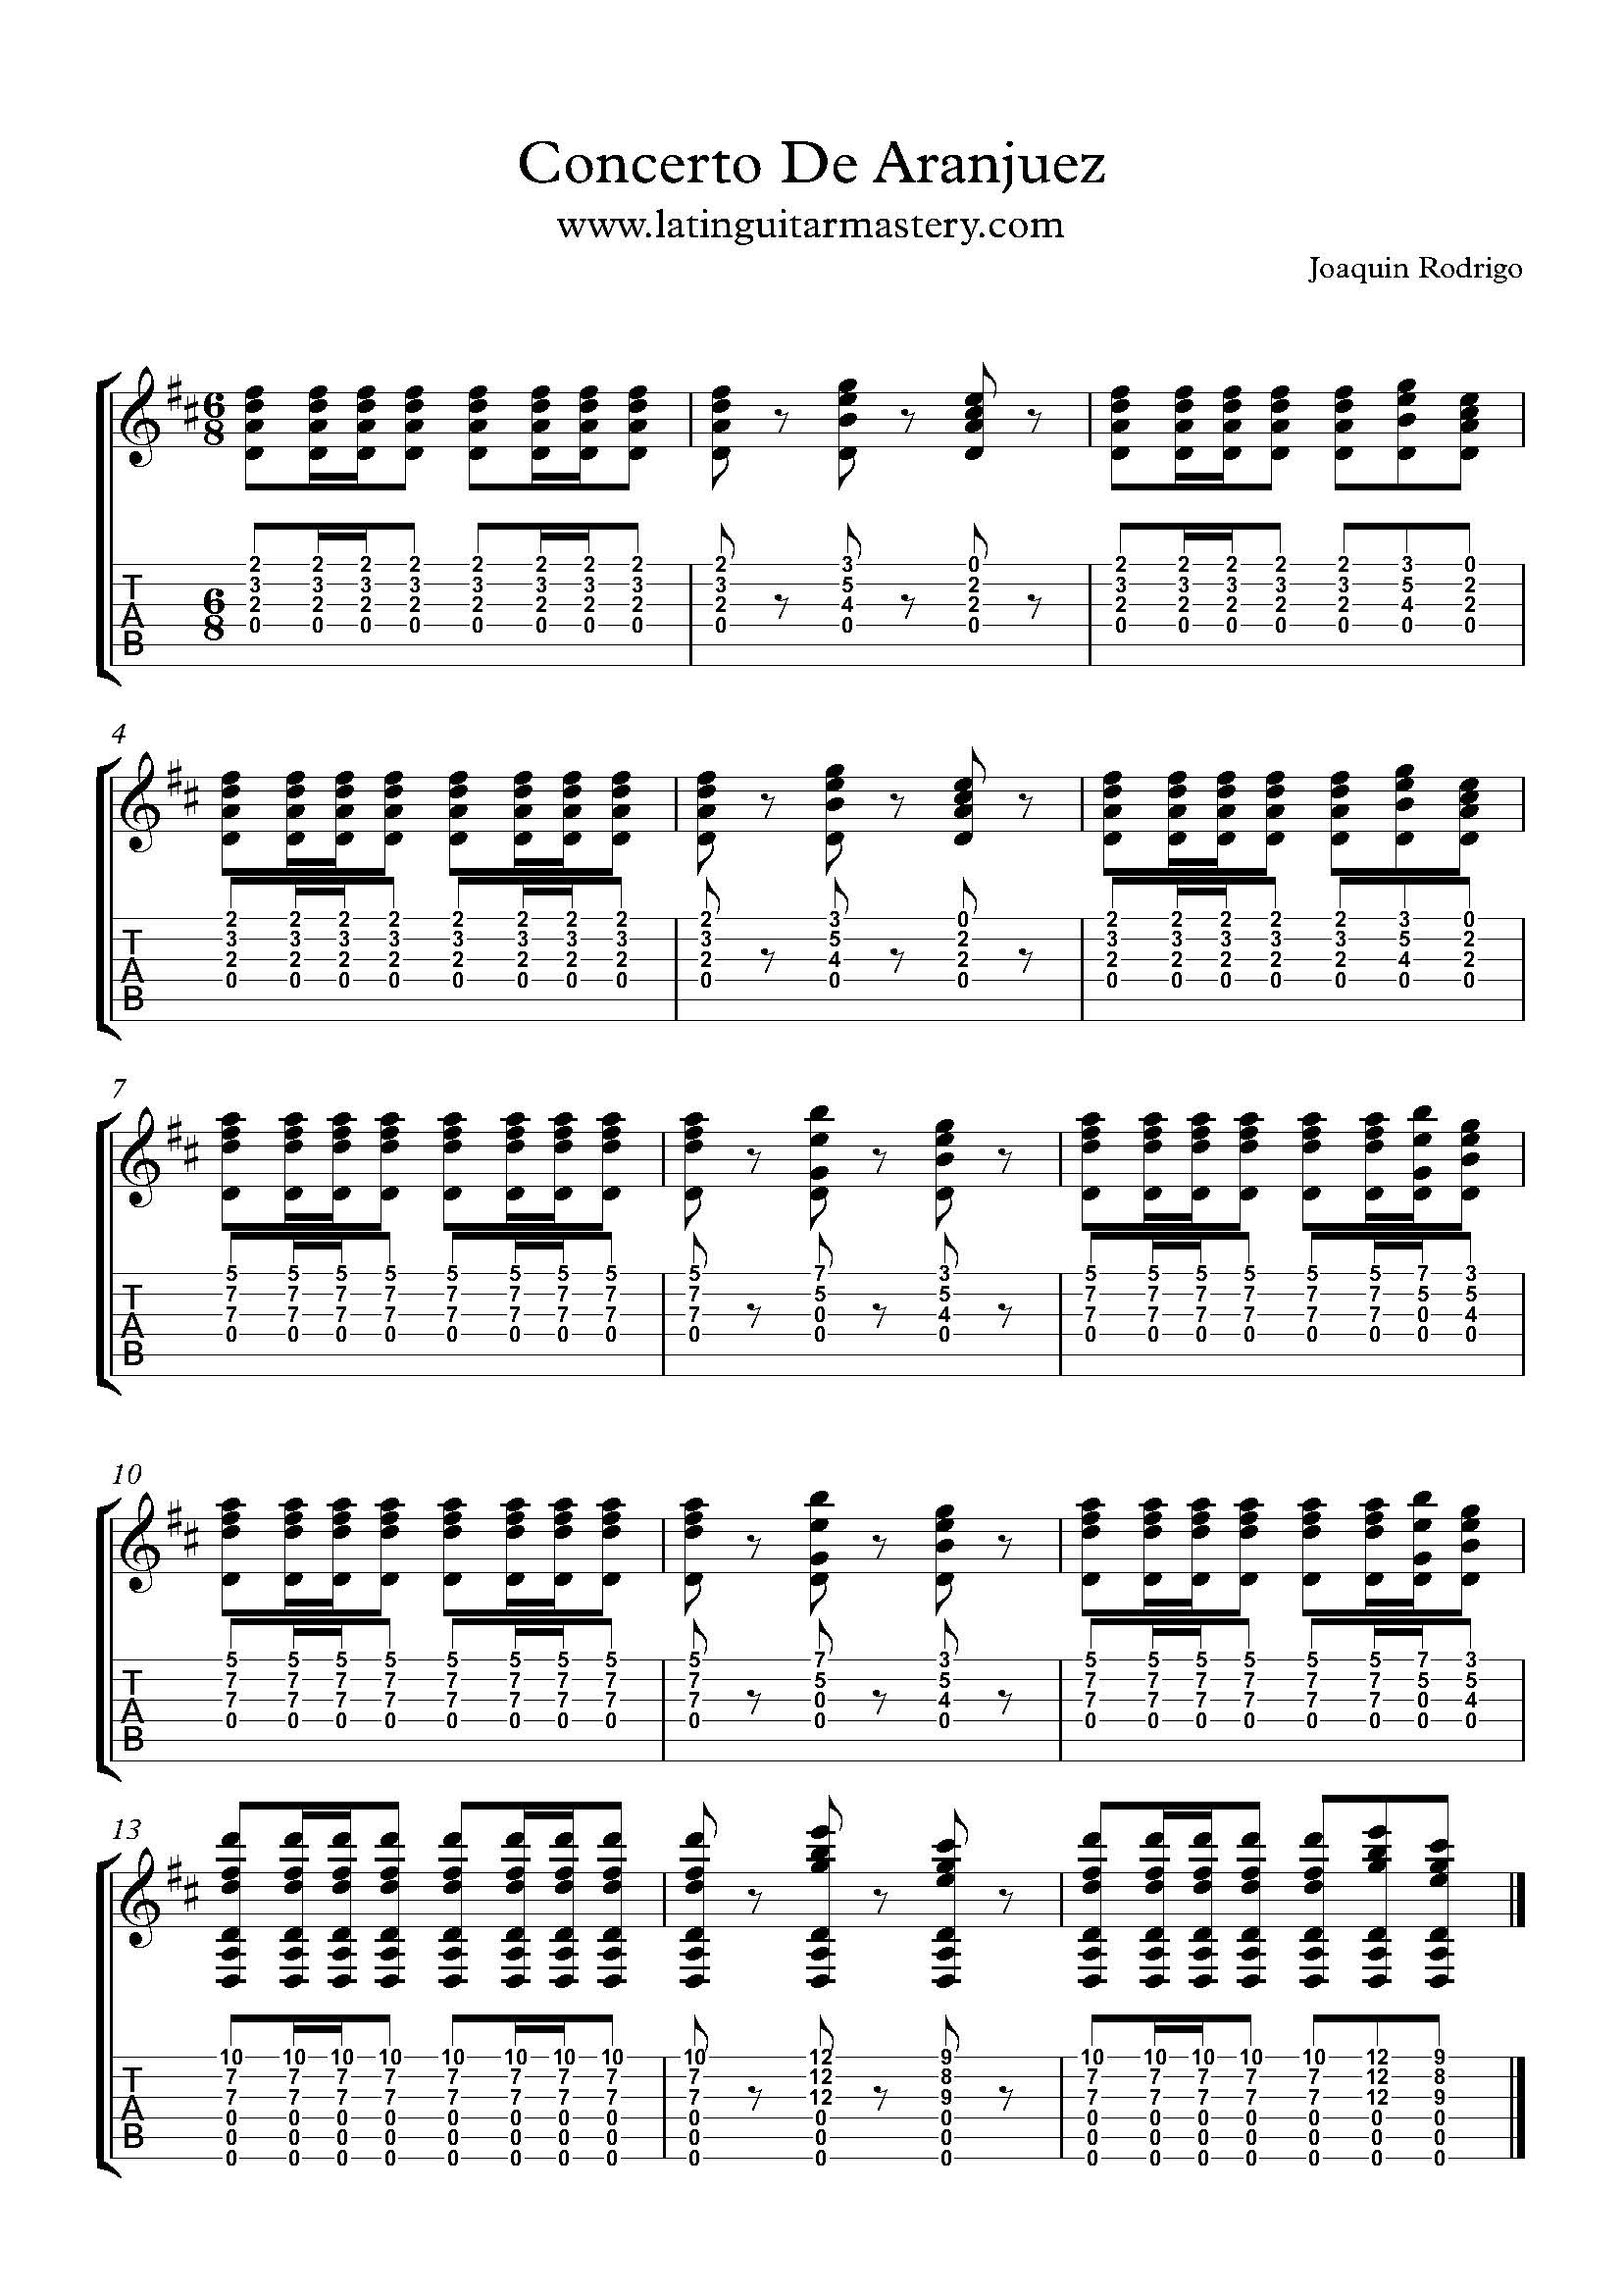 Concerto De Aranjuez Intro Latin Guitar Mastery